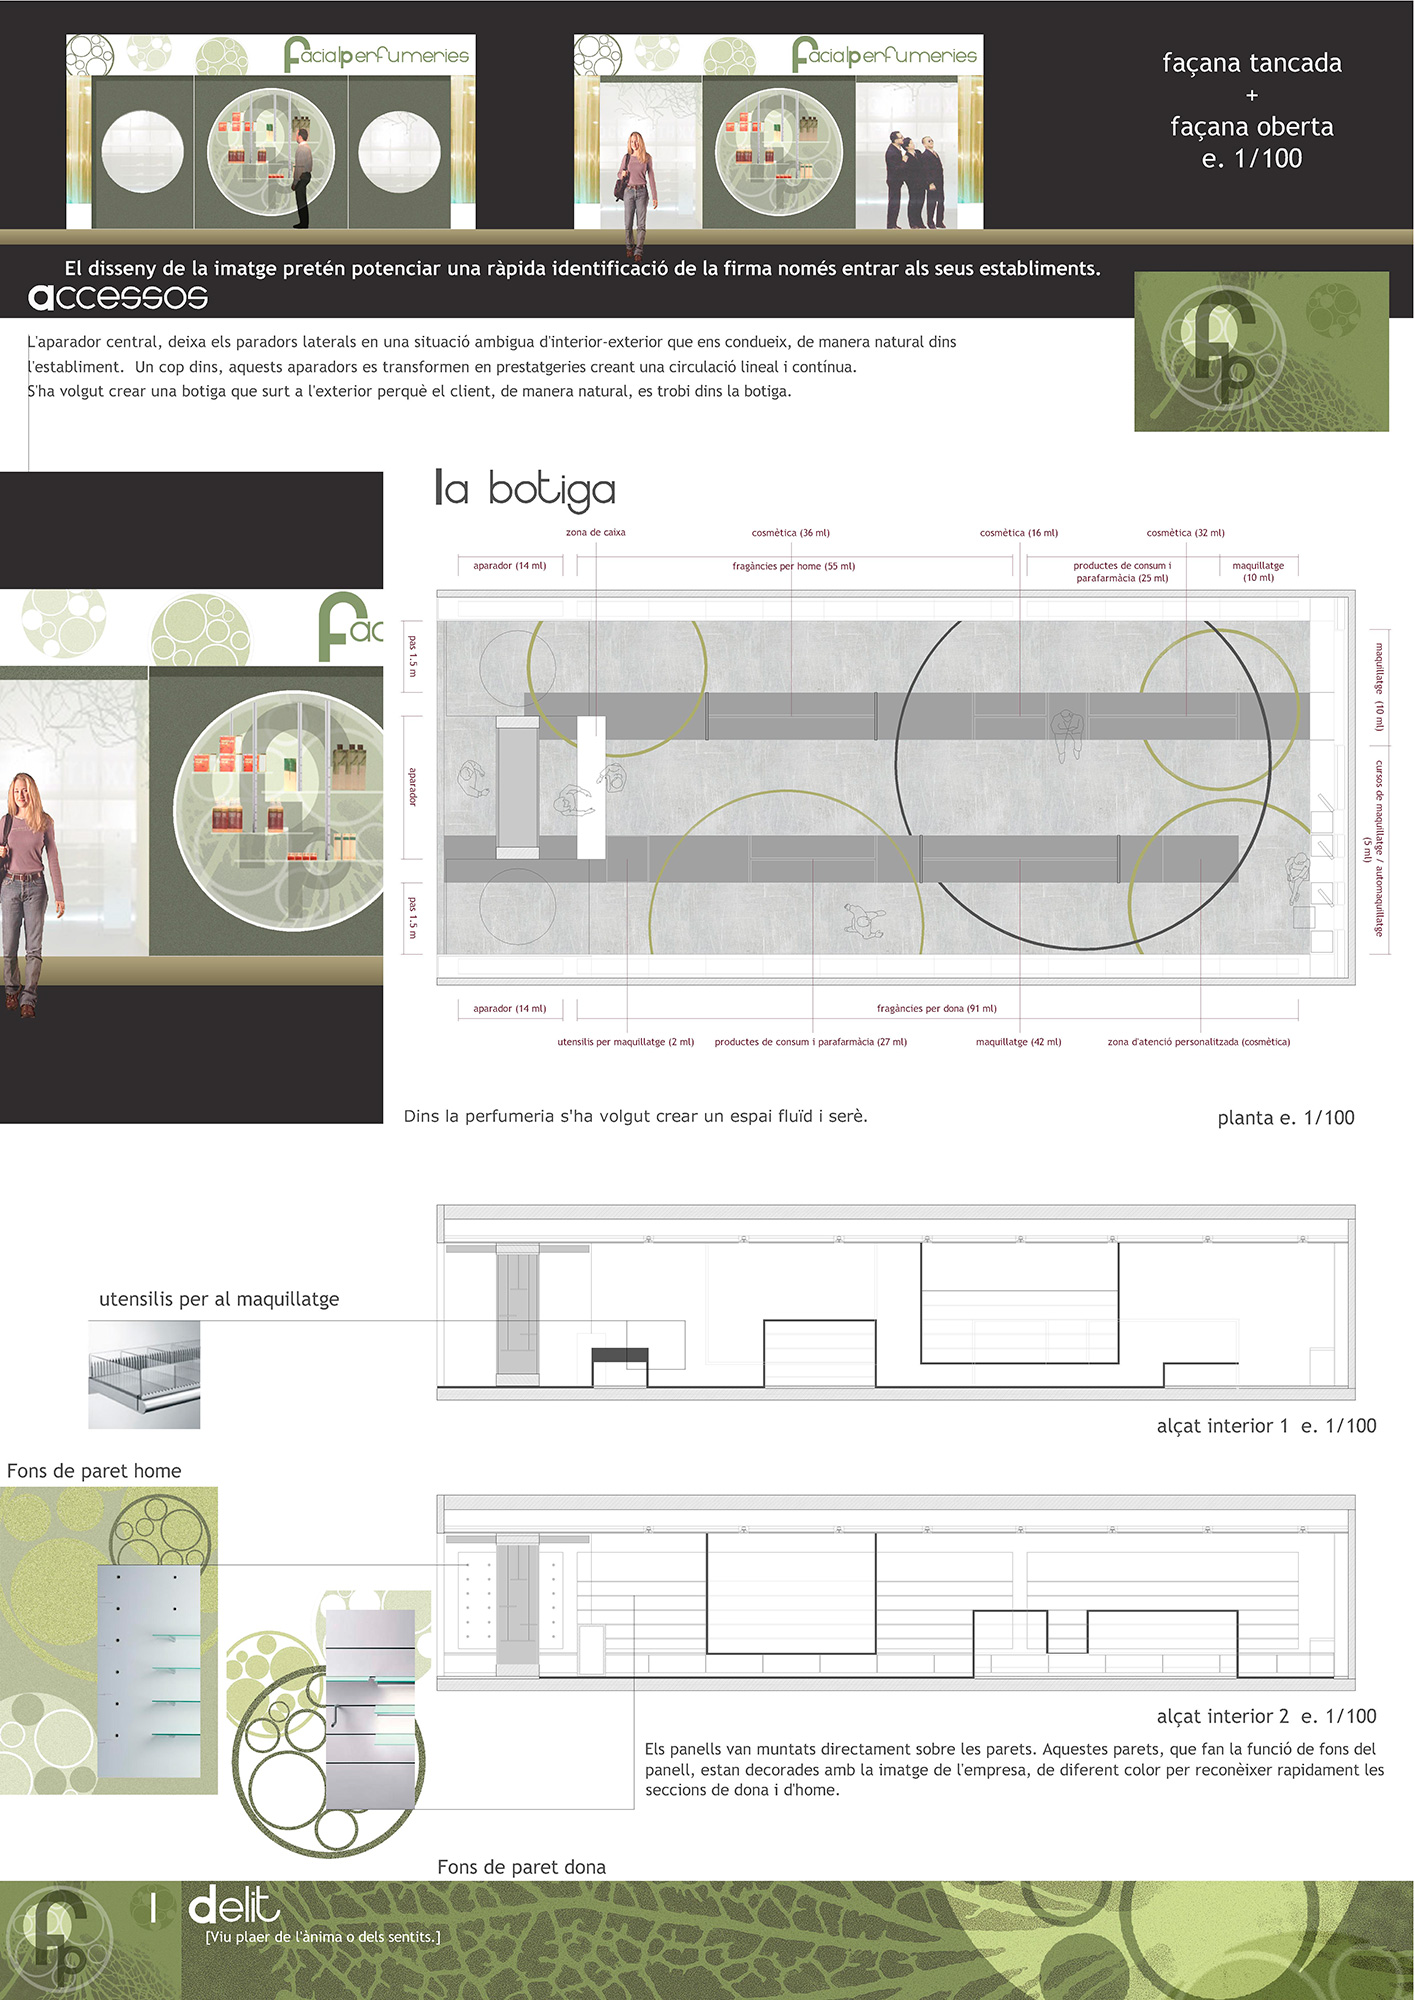 http://www.oa-arquitectes.com/wp-content/uploads/2018/05/05-1.jpg